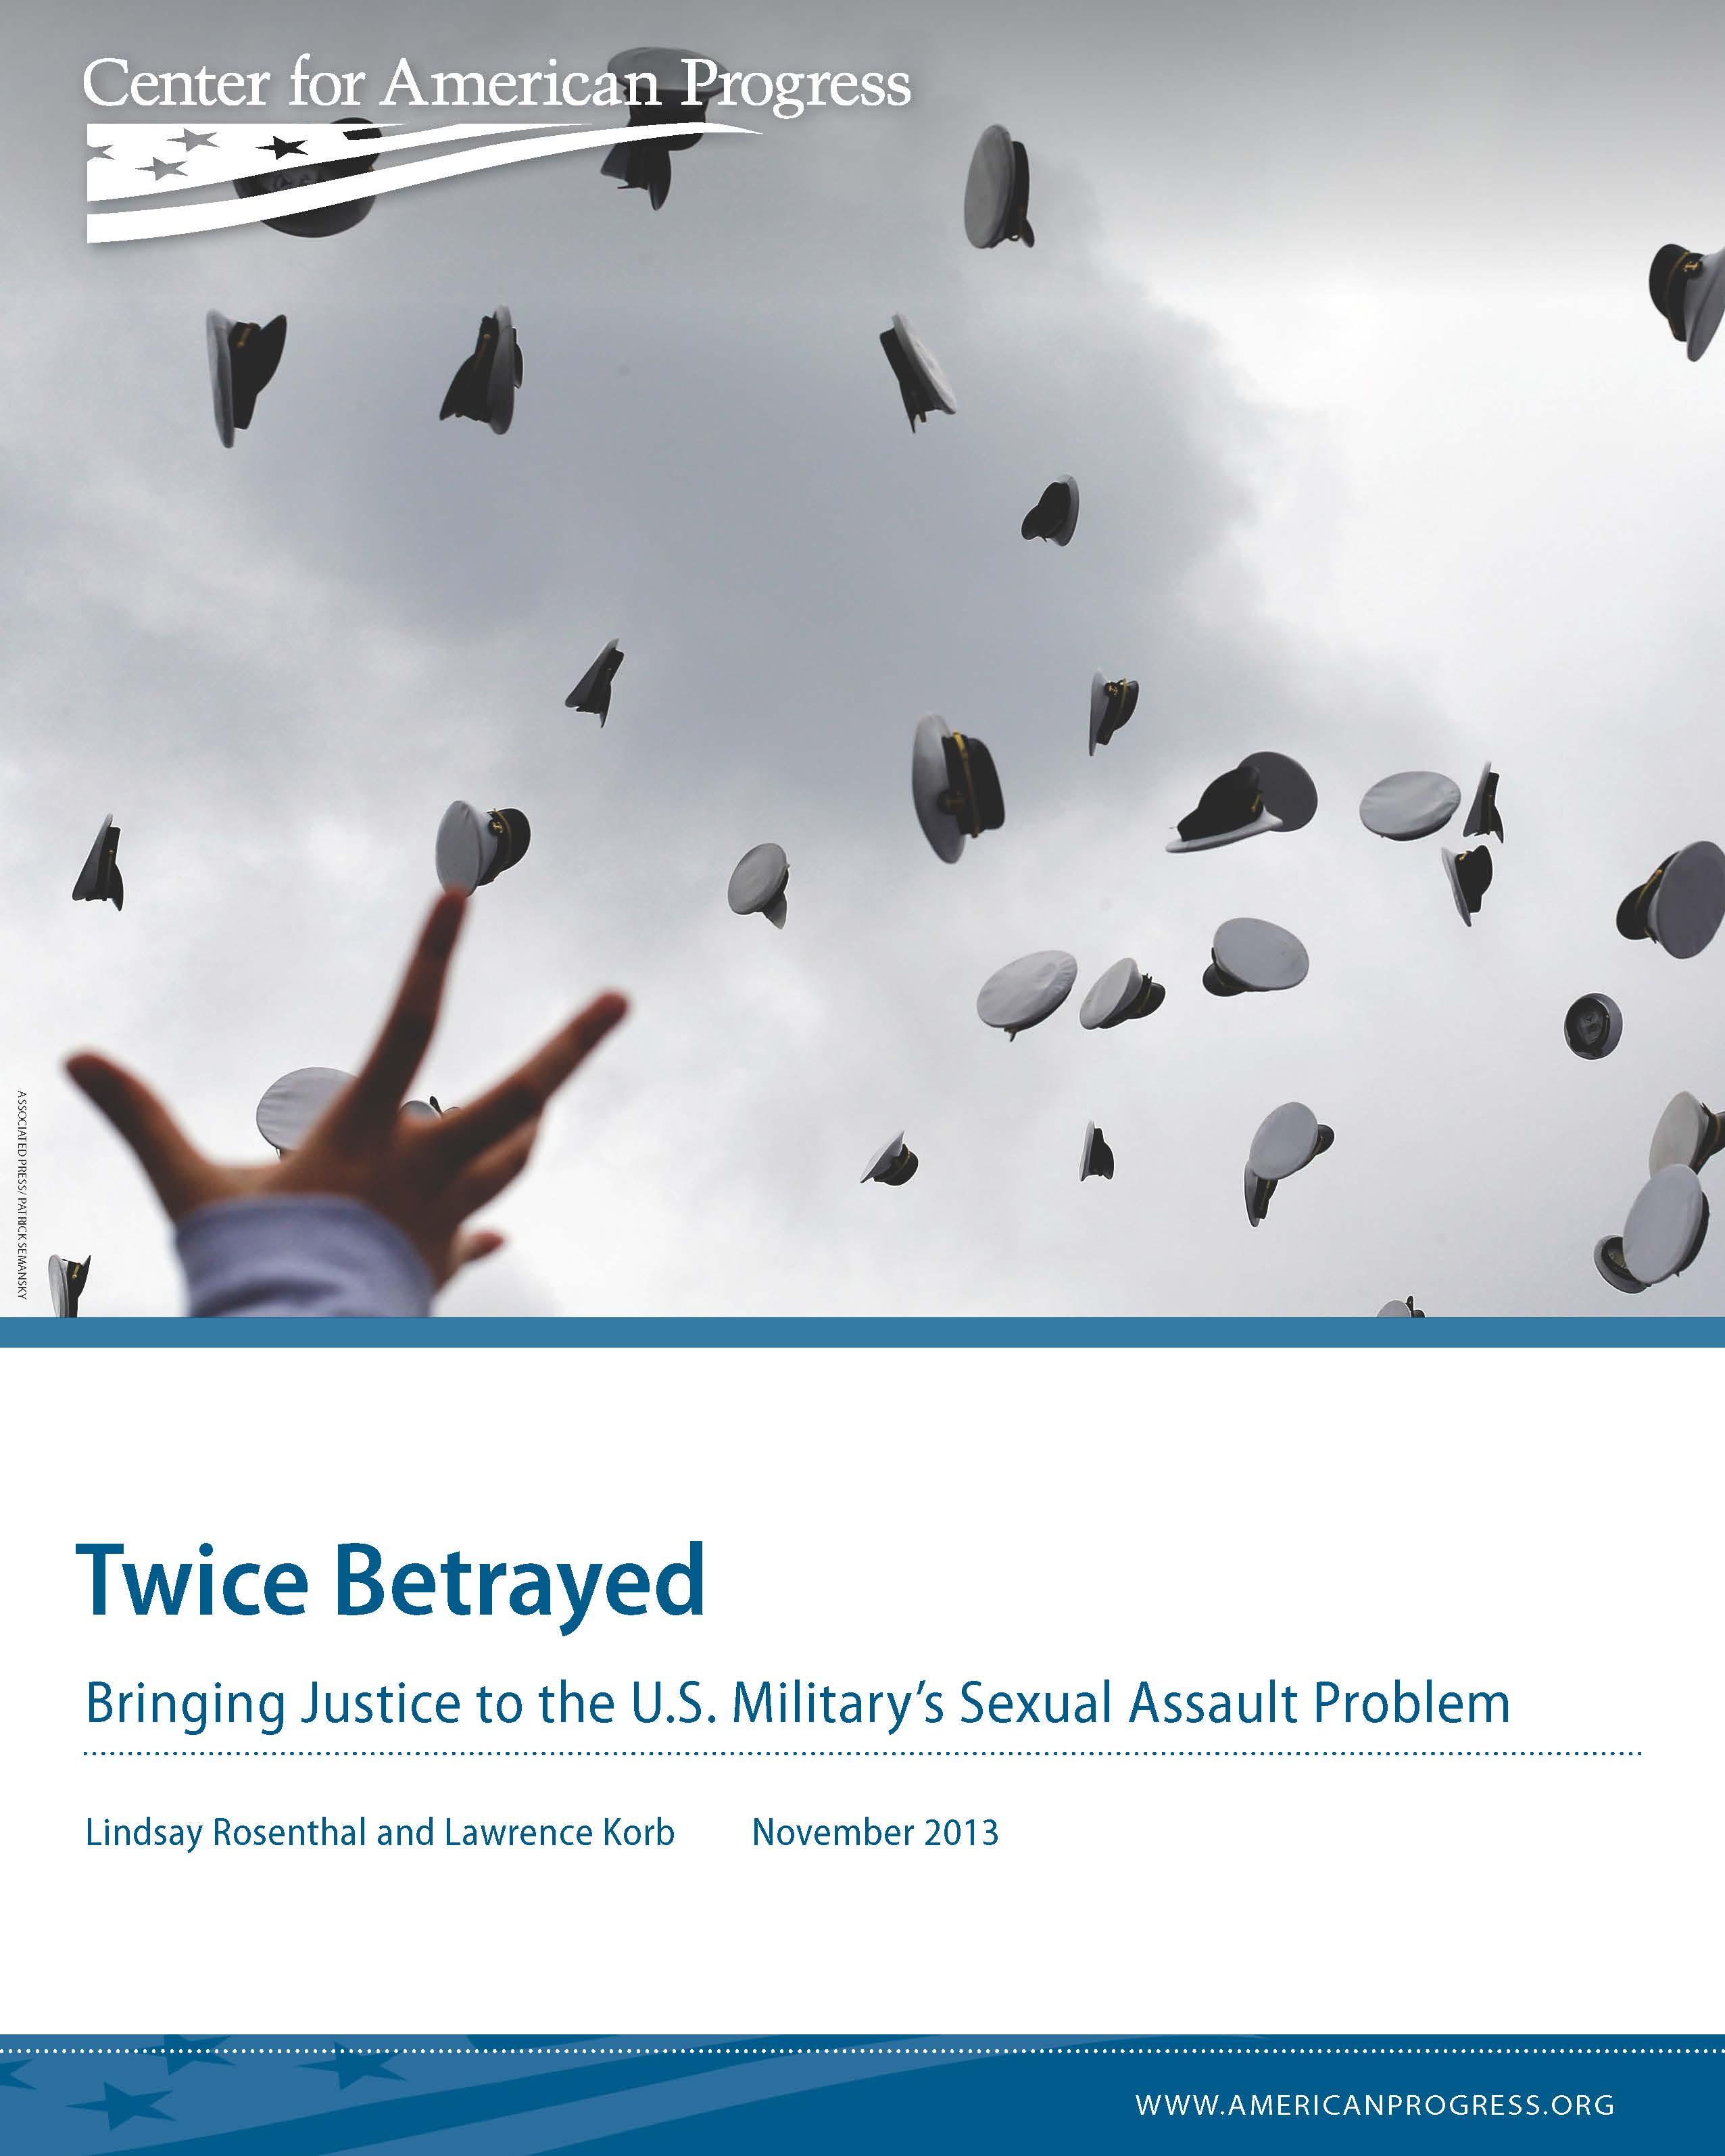 Twice Betrayed